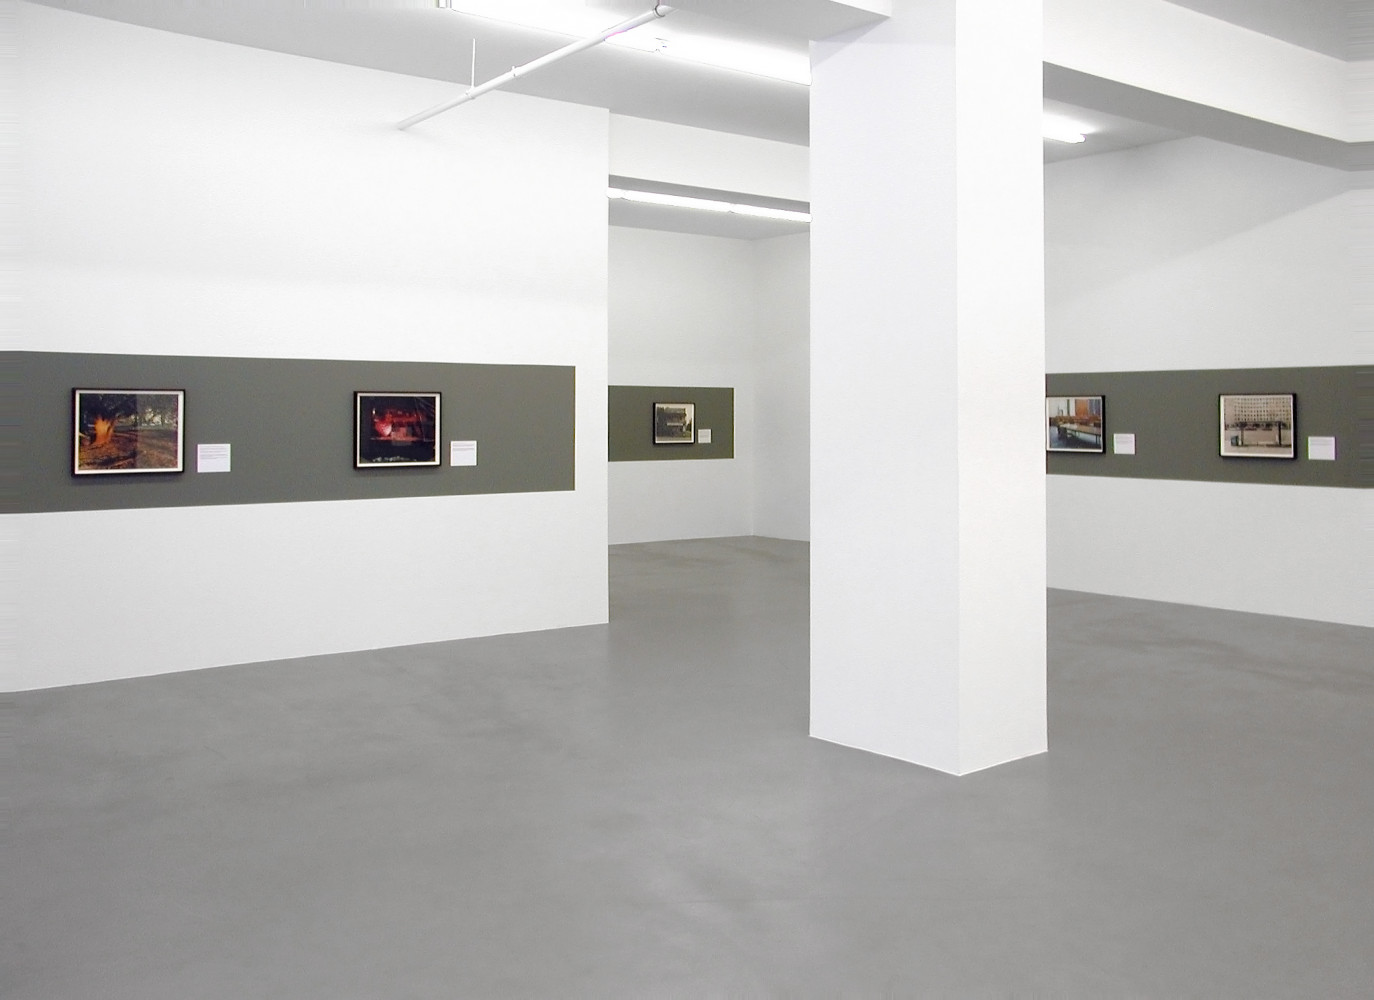 Joel Sternfeld, 'On This Site', Installation view, Buchmann Galerie, 2009